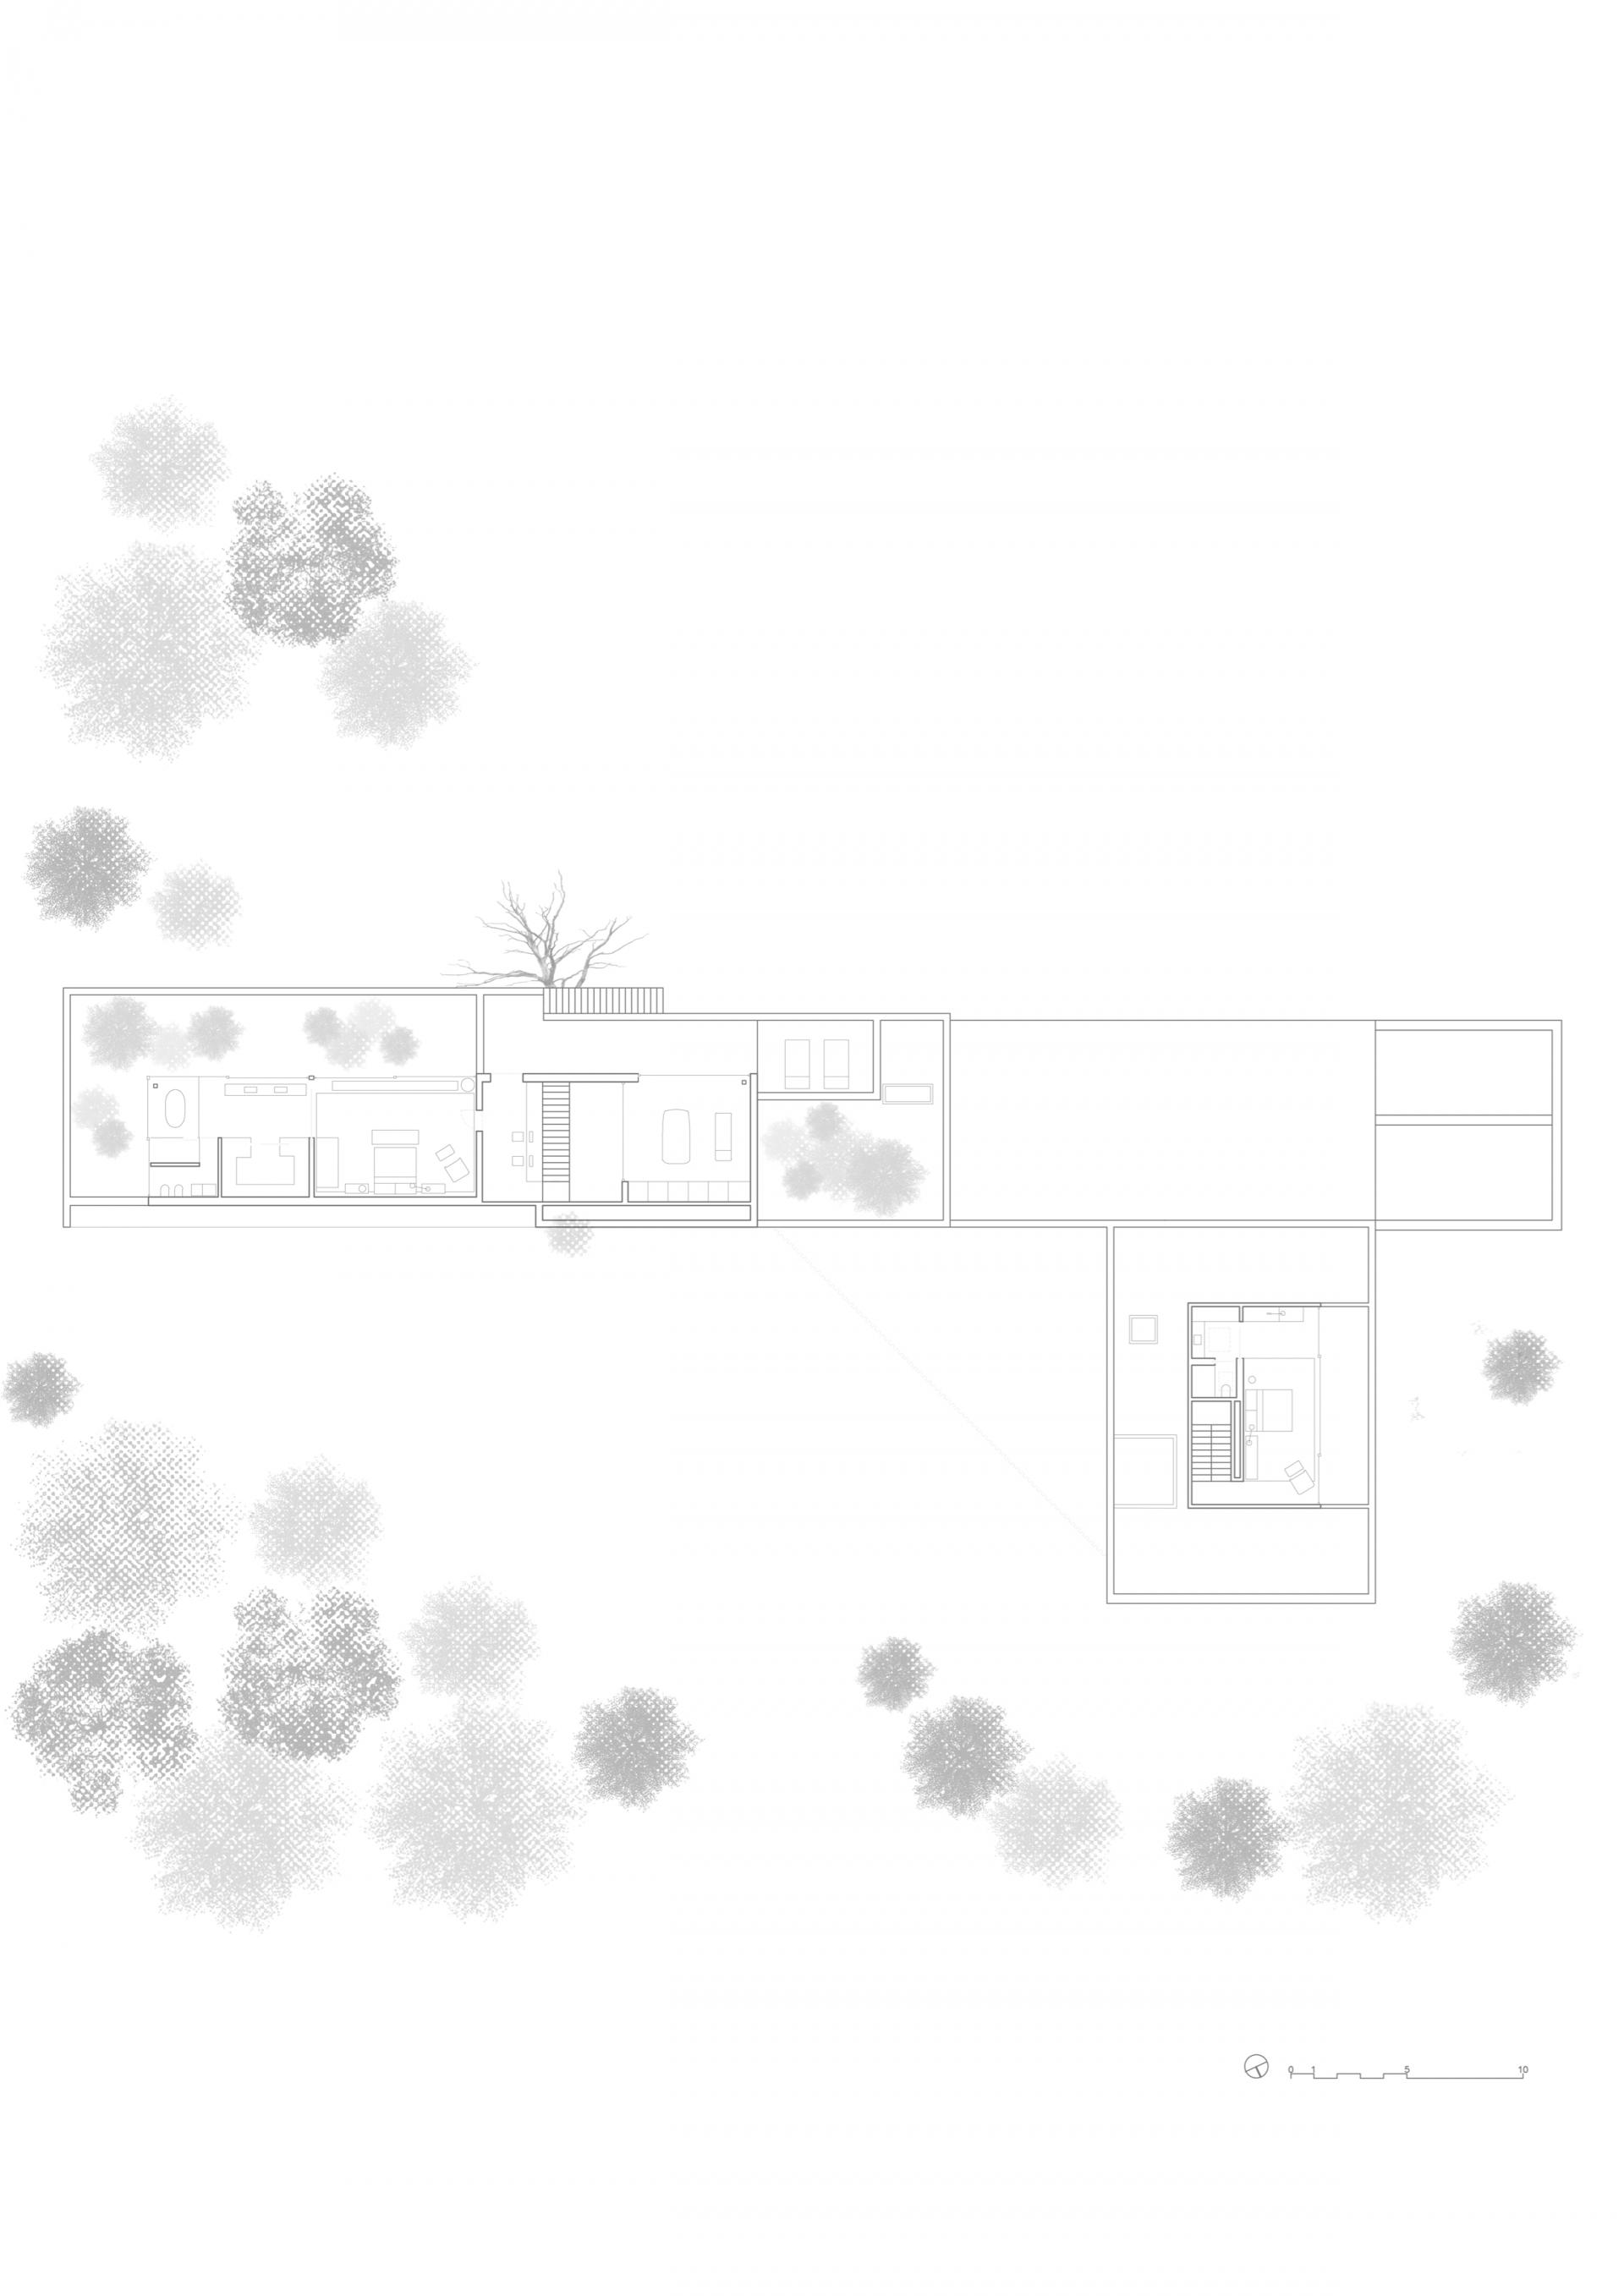 L shape ITU house near Sao Paulo by Studio Arthur Casas-21